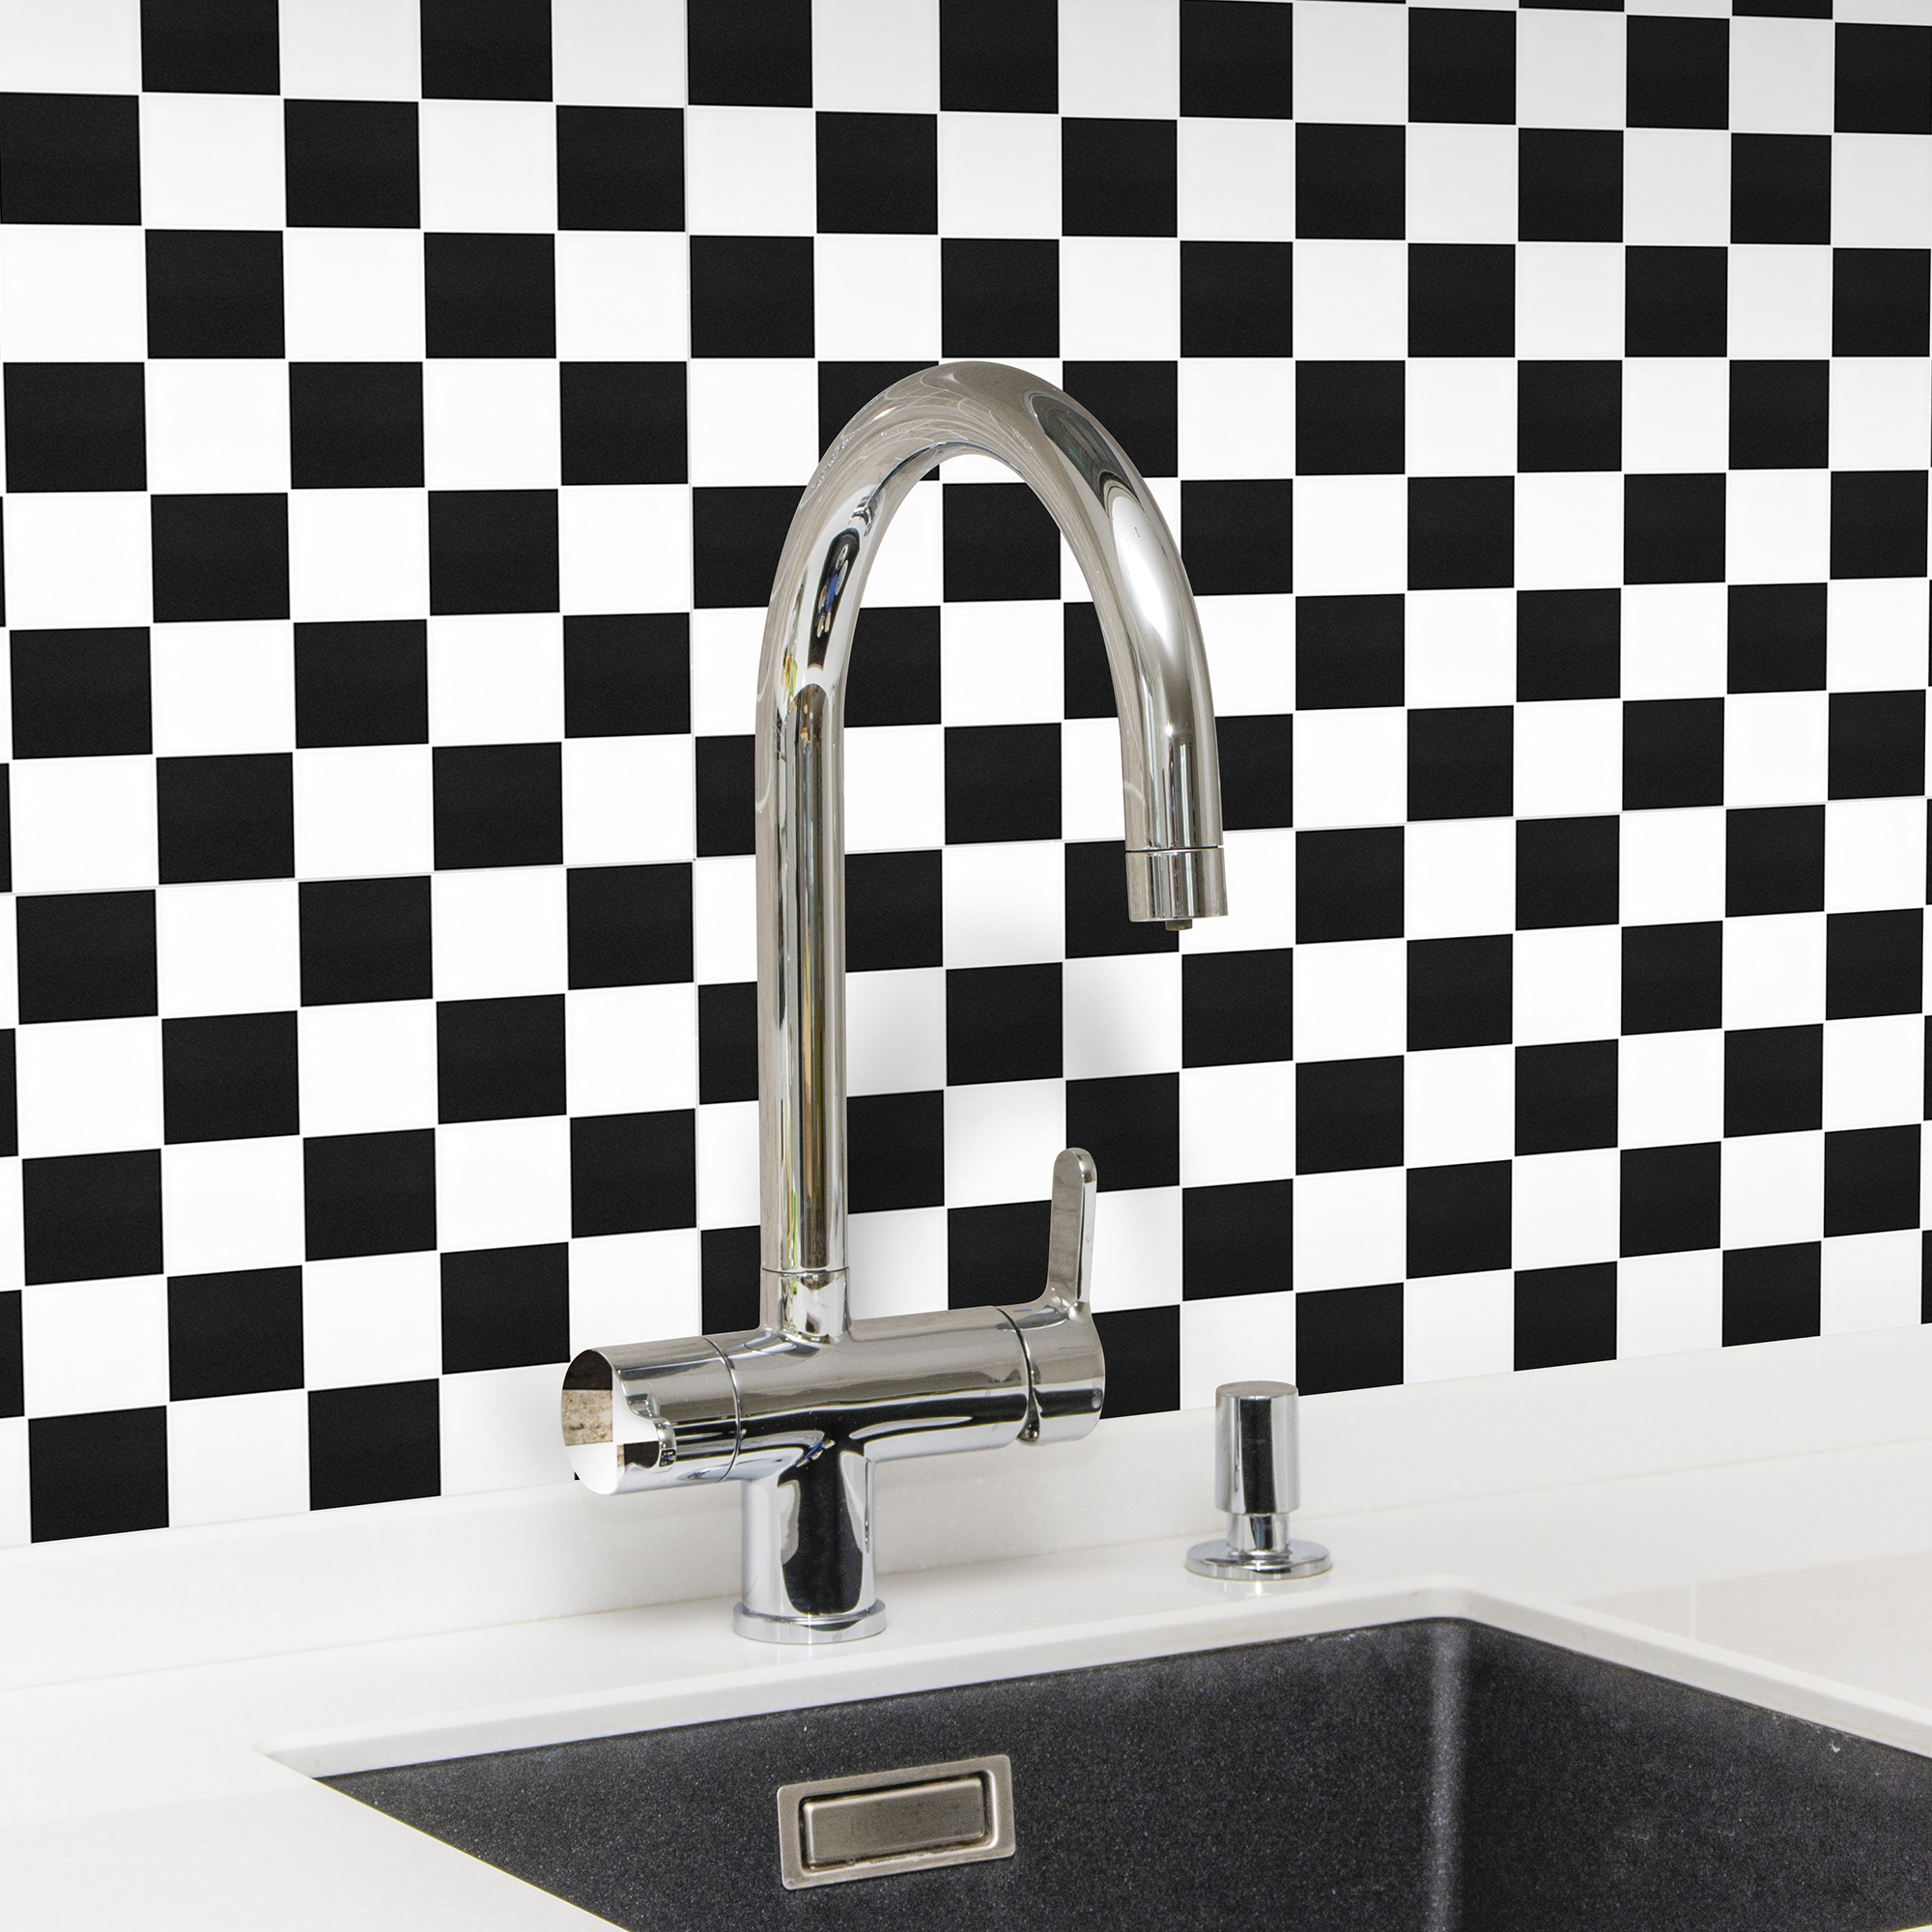 Klinkermosaik Arredo Titan Mix Black/White Blank 5x5 cm